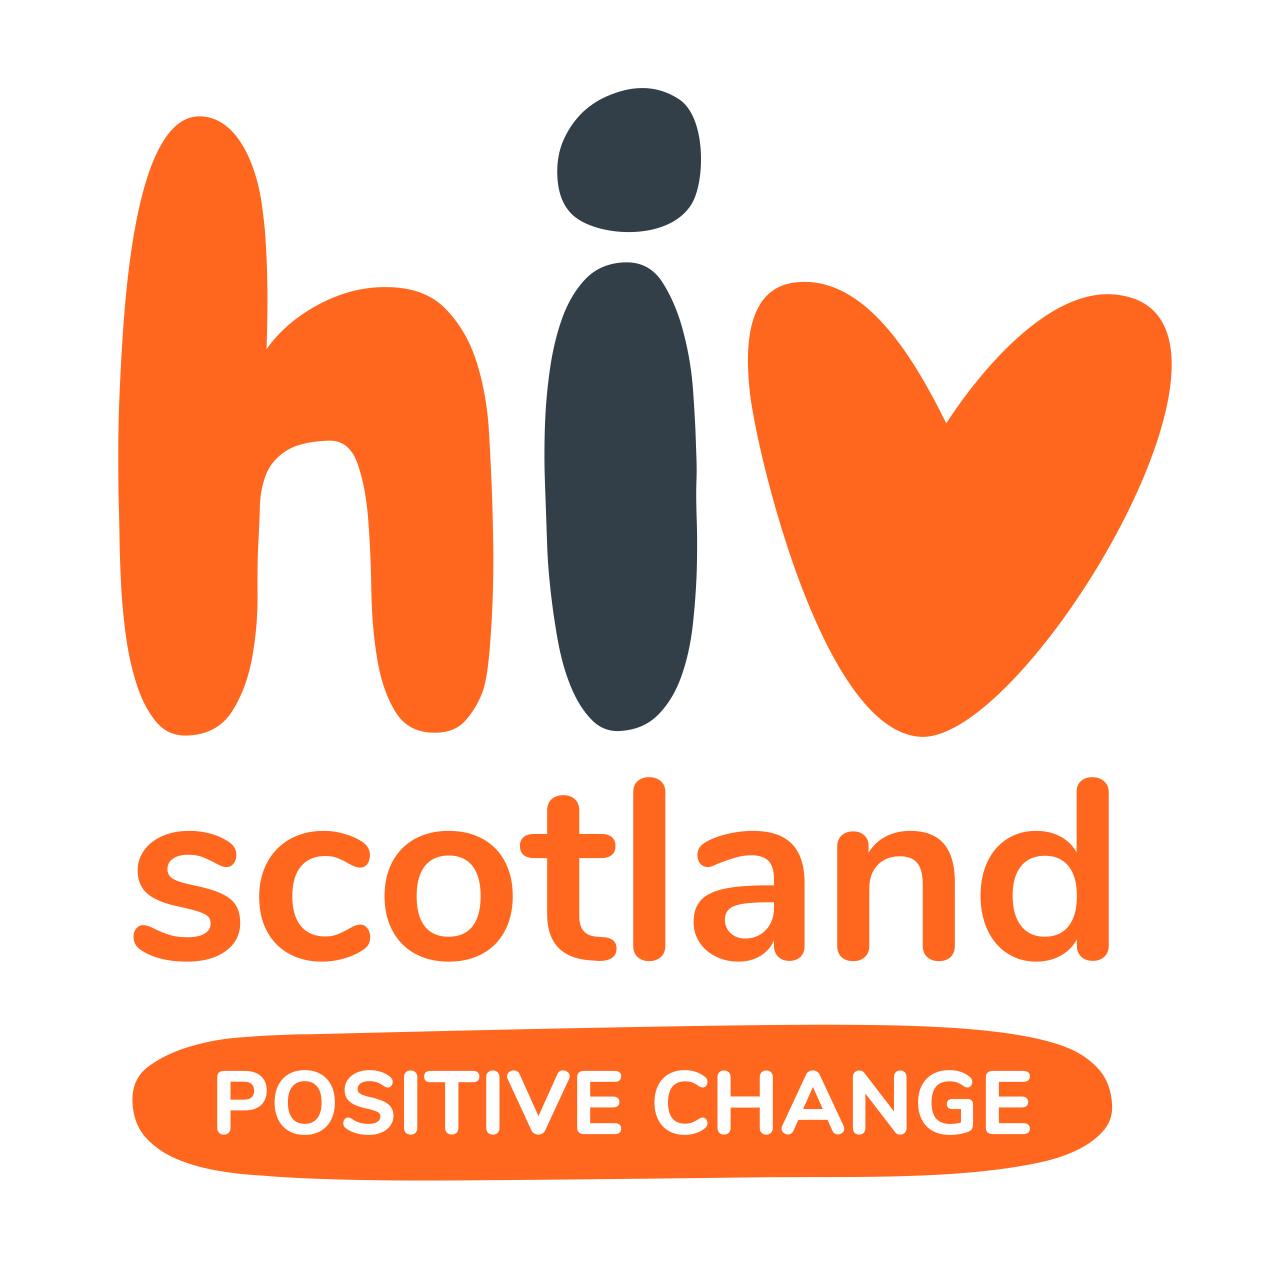 HIV Scotland